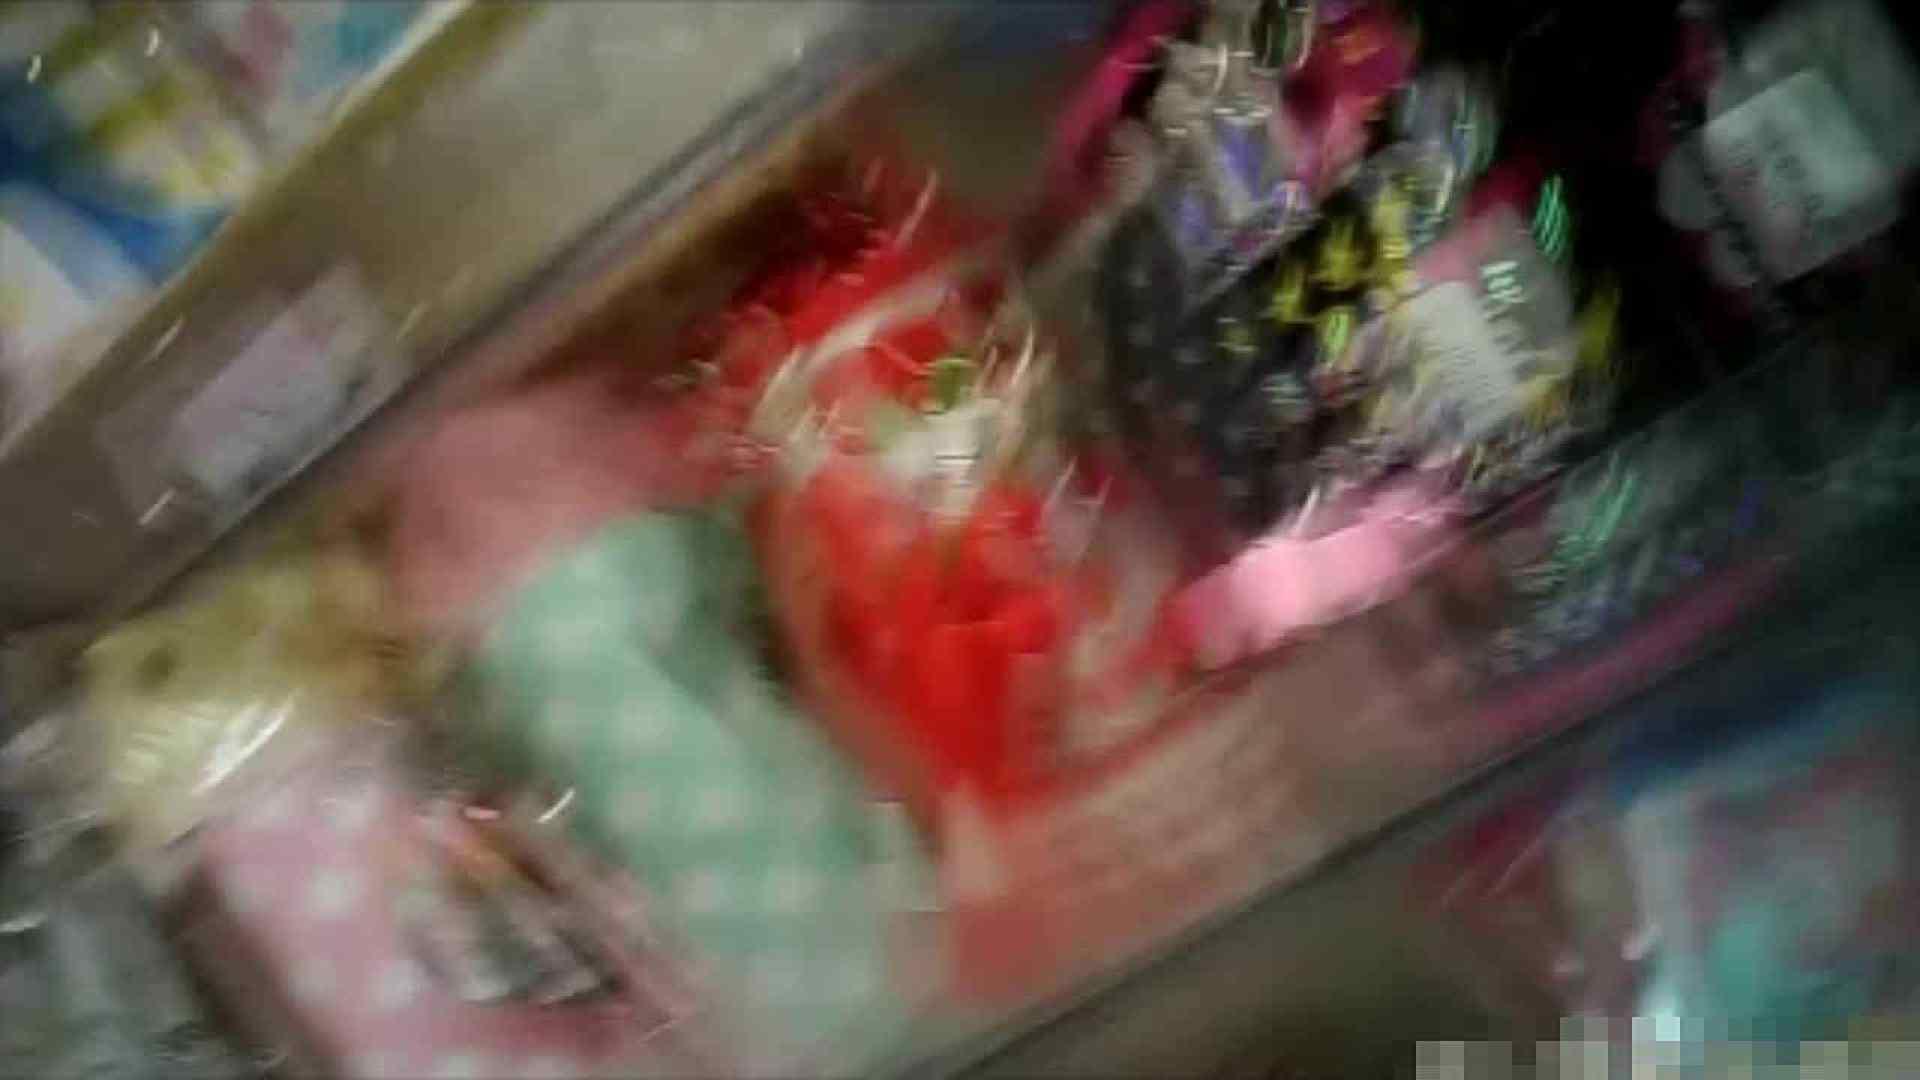 NO.5 意外に豊満な胸の雑貨屋で物色中のお女市さん 胸チラ   チラ見せ  66PIX 9